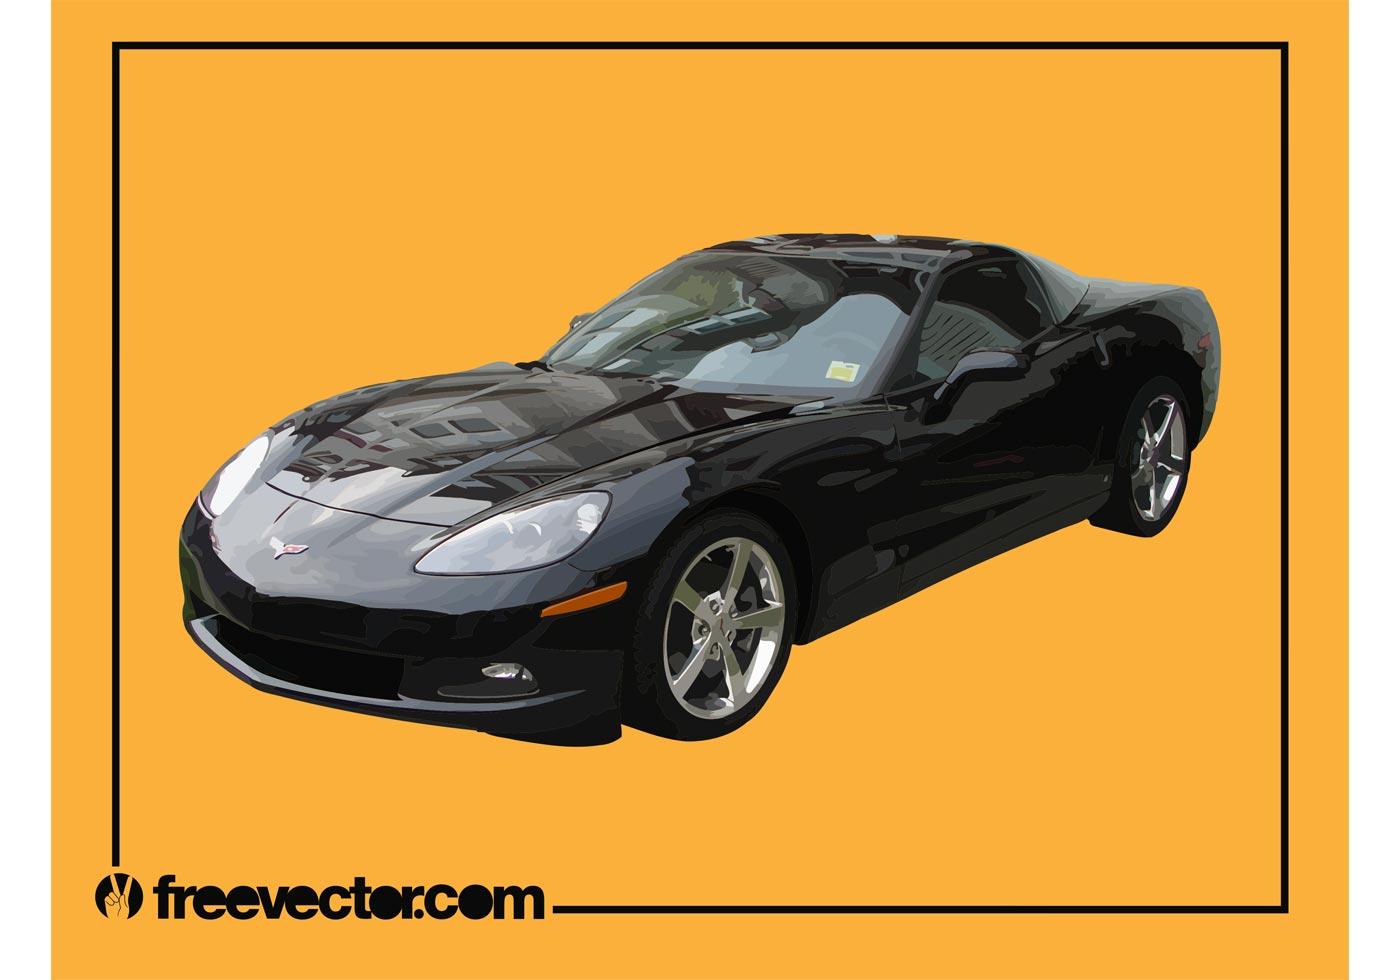 black corvette download free vector art stock graphics